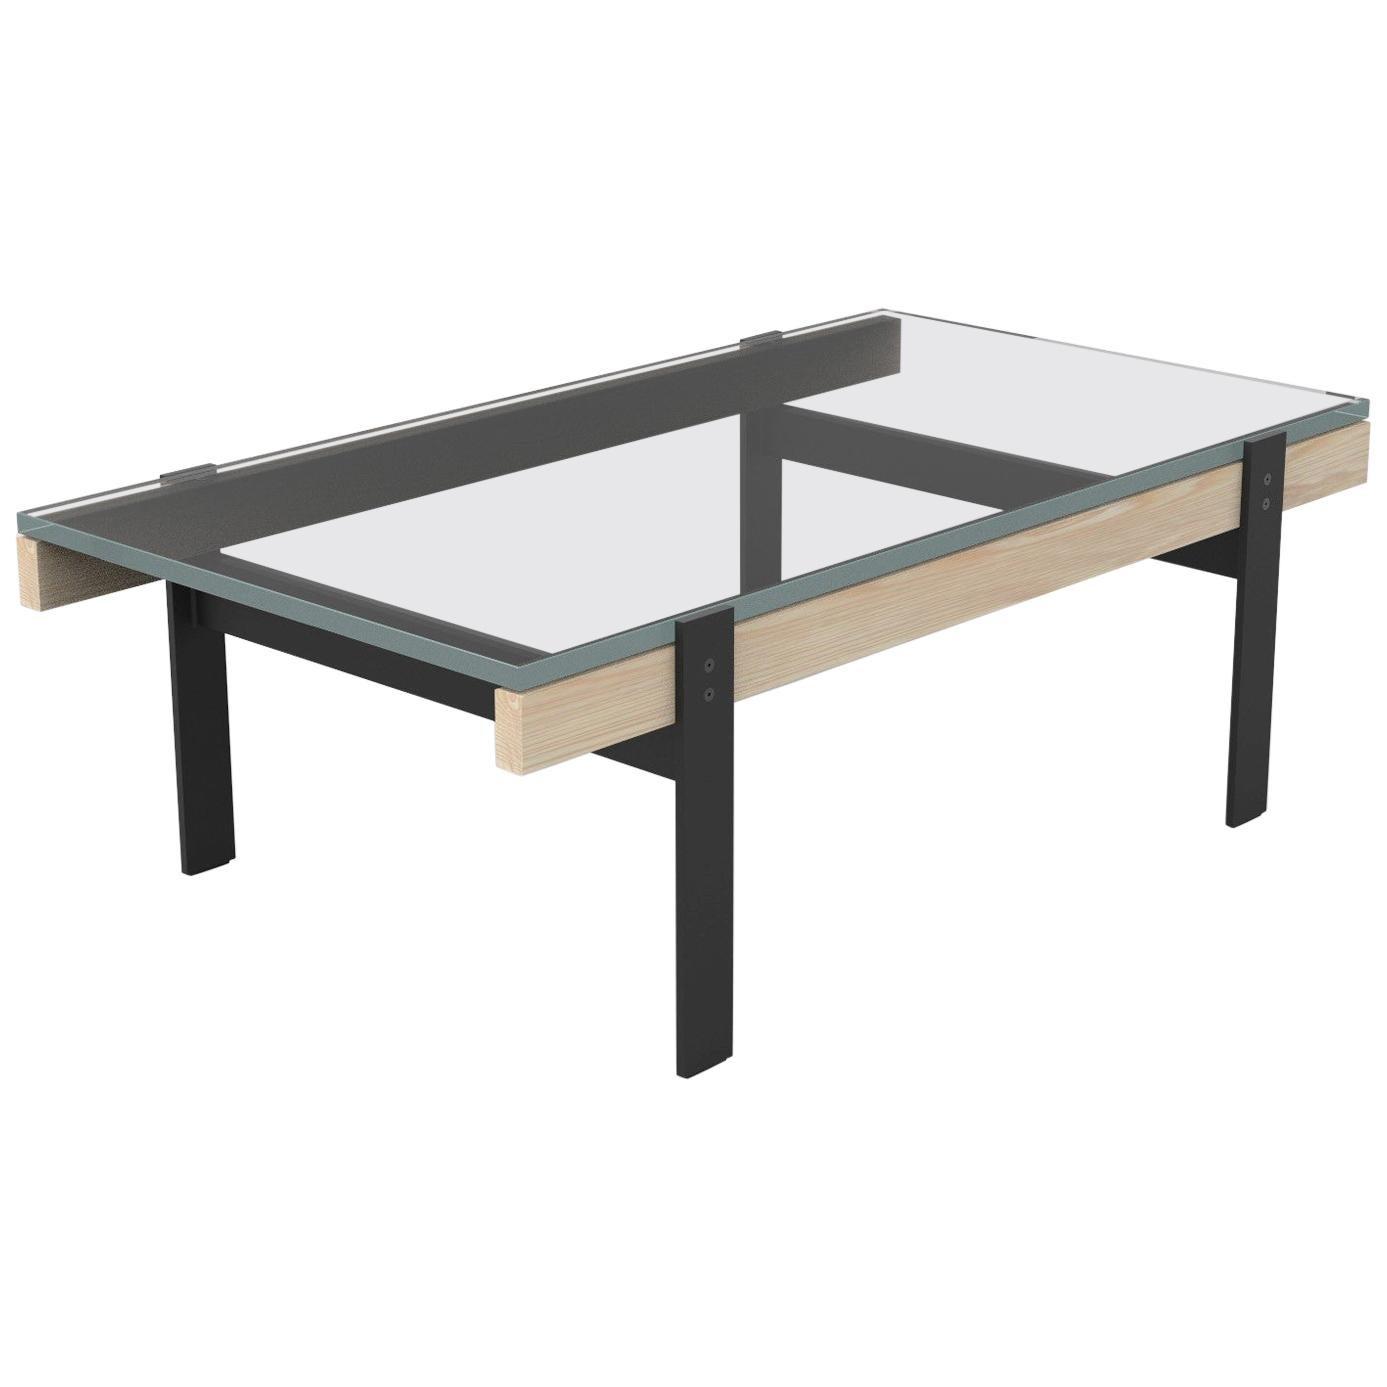 "Coffee Table ""Beam"" by Matthew Hilton"